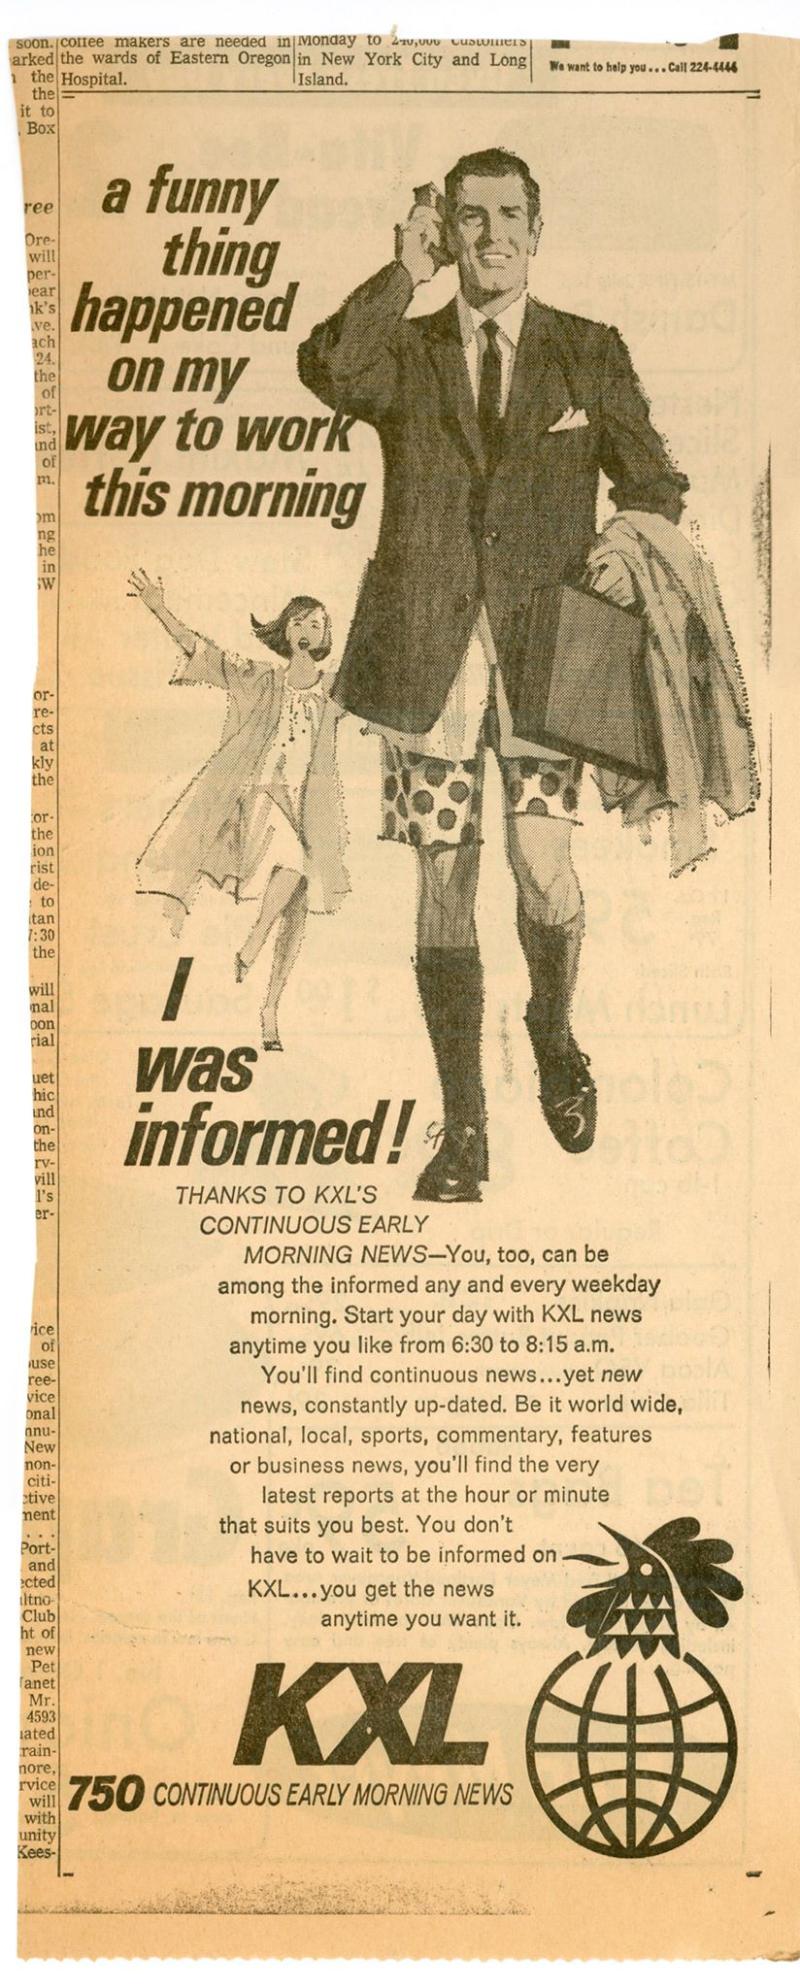 Kxl informed